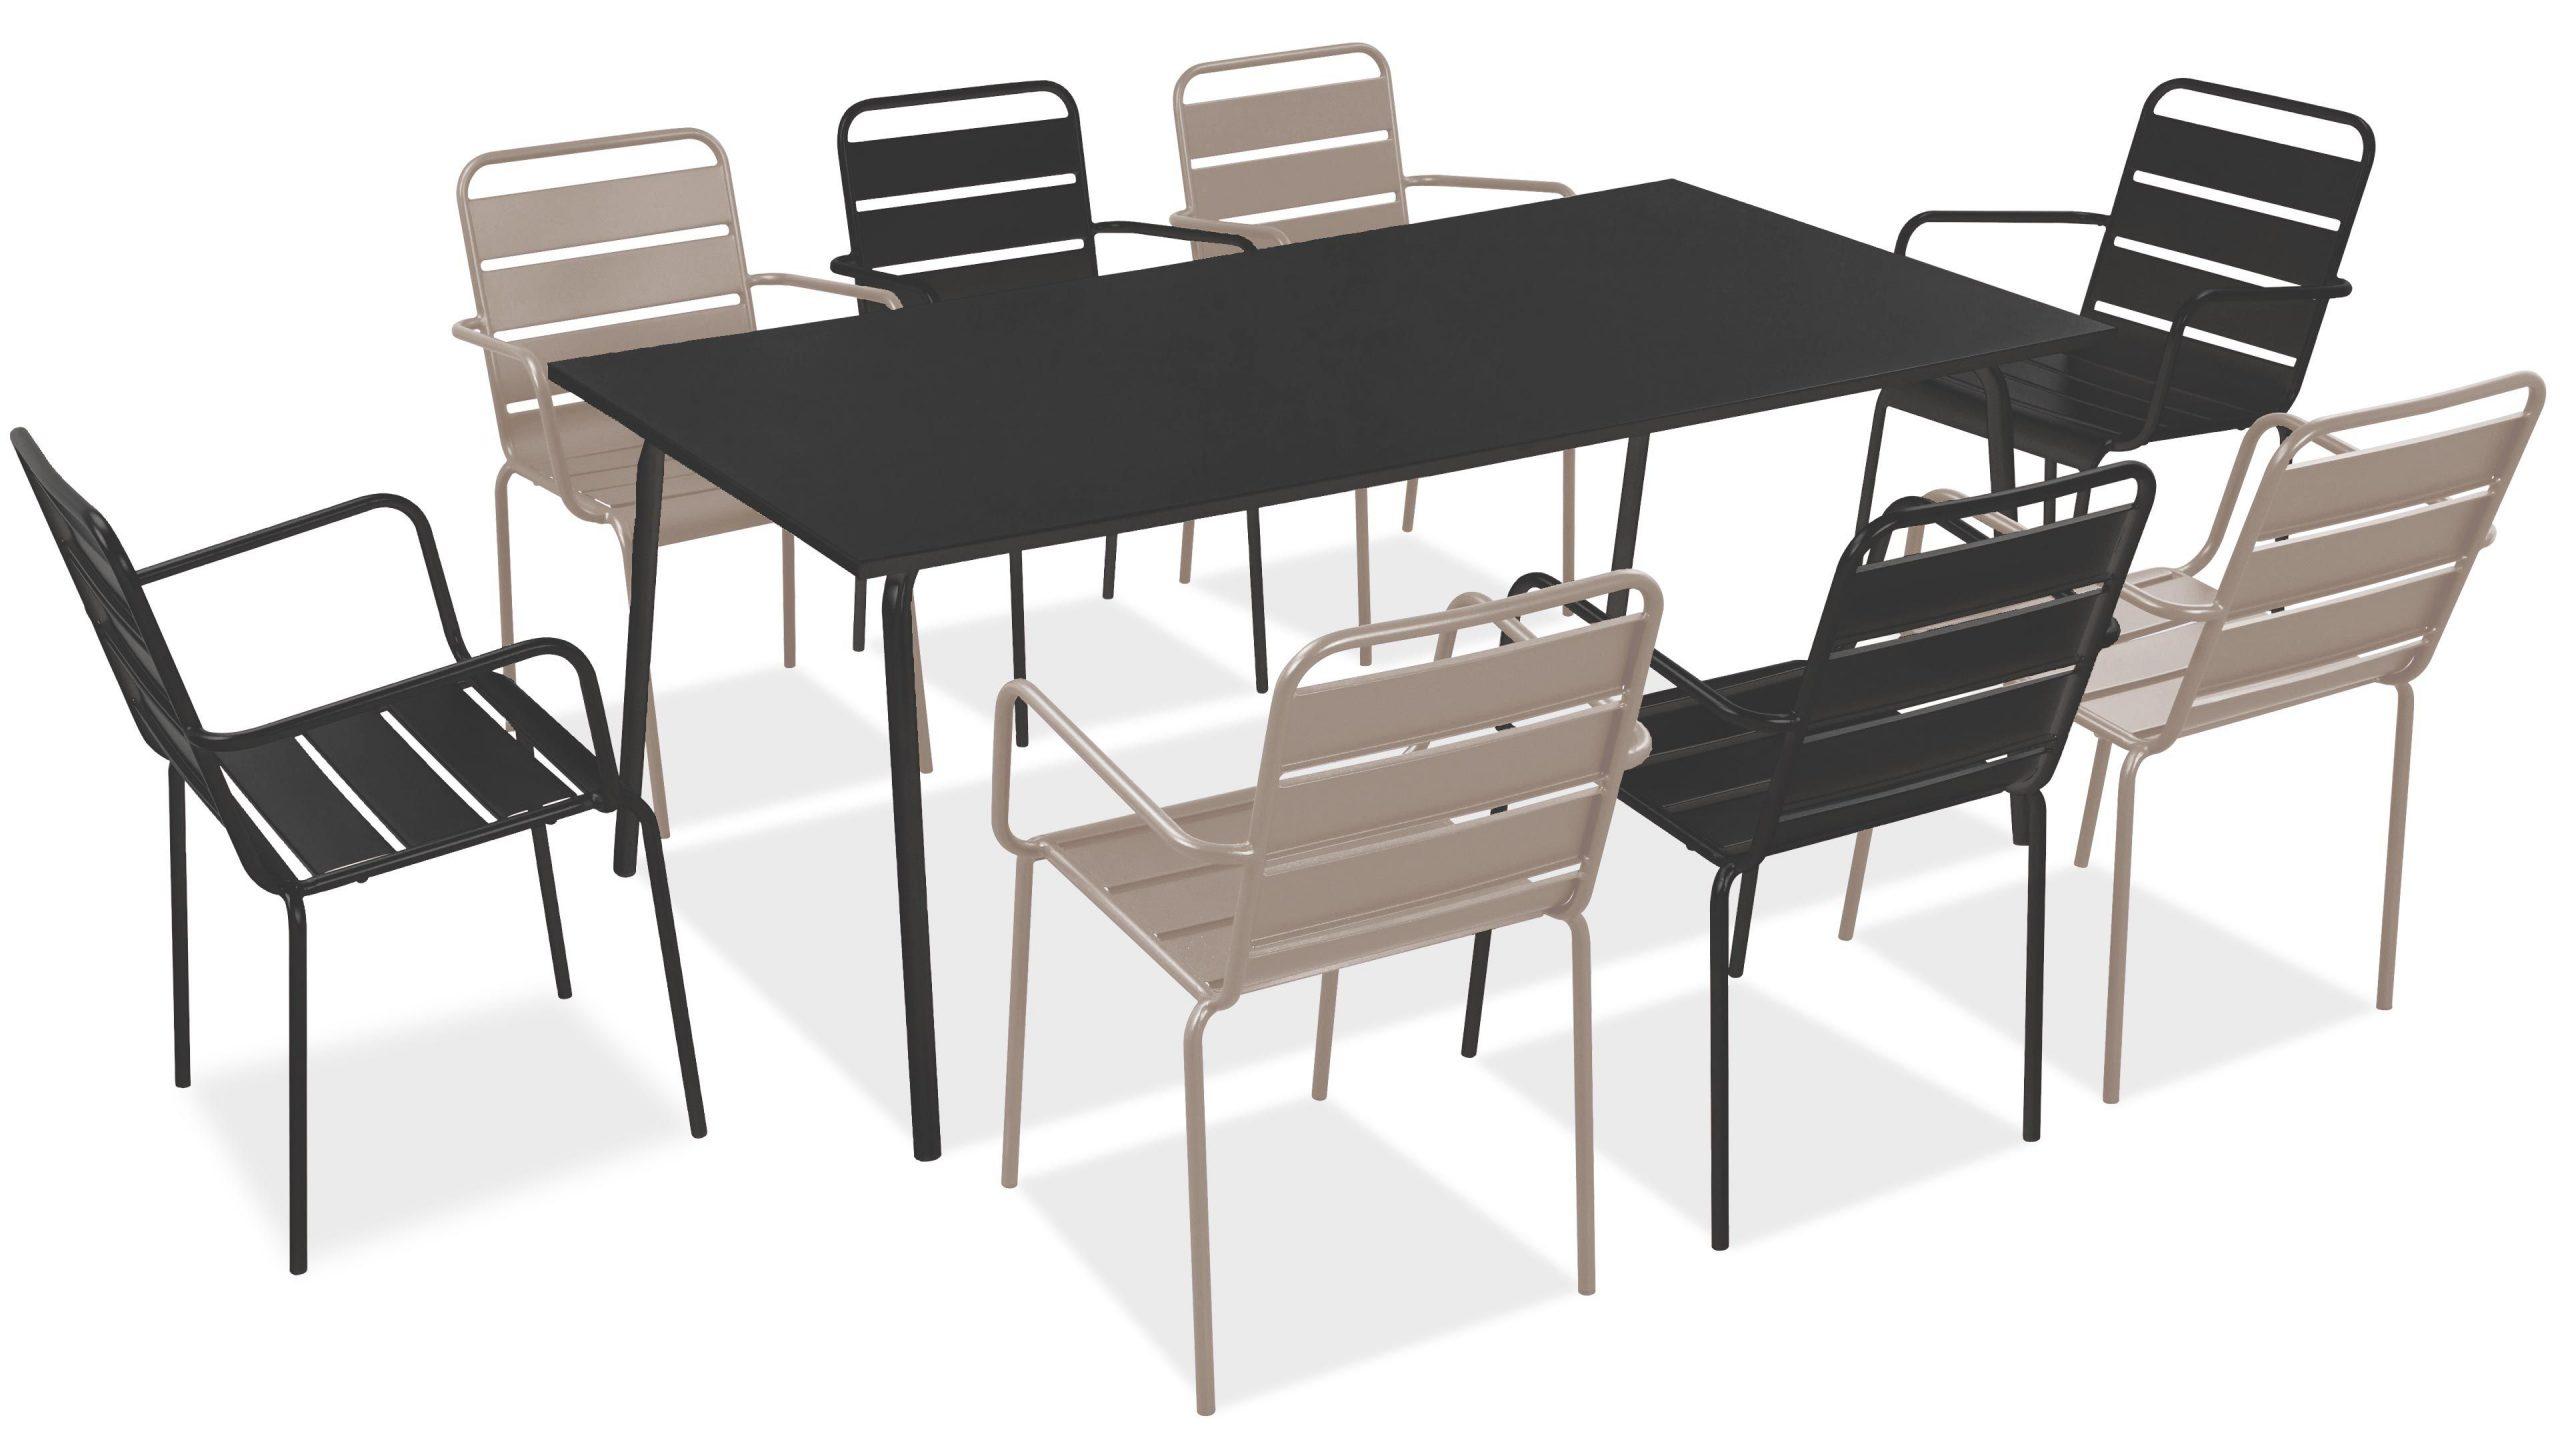 Salon De Jardin Metal Table Et Fauteuils destiné Solde Mobilier De Jardin